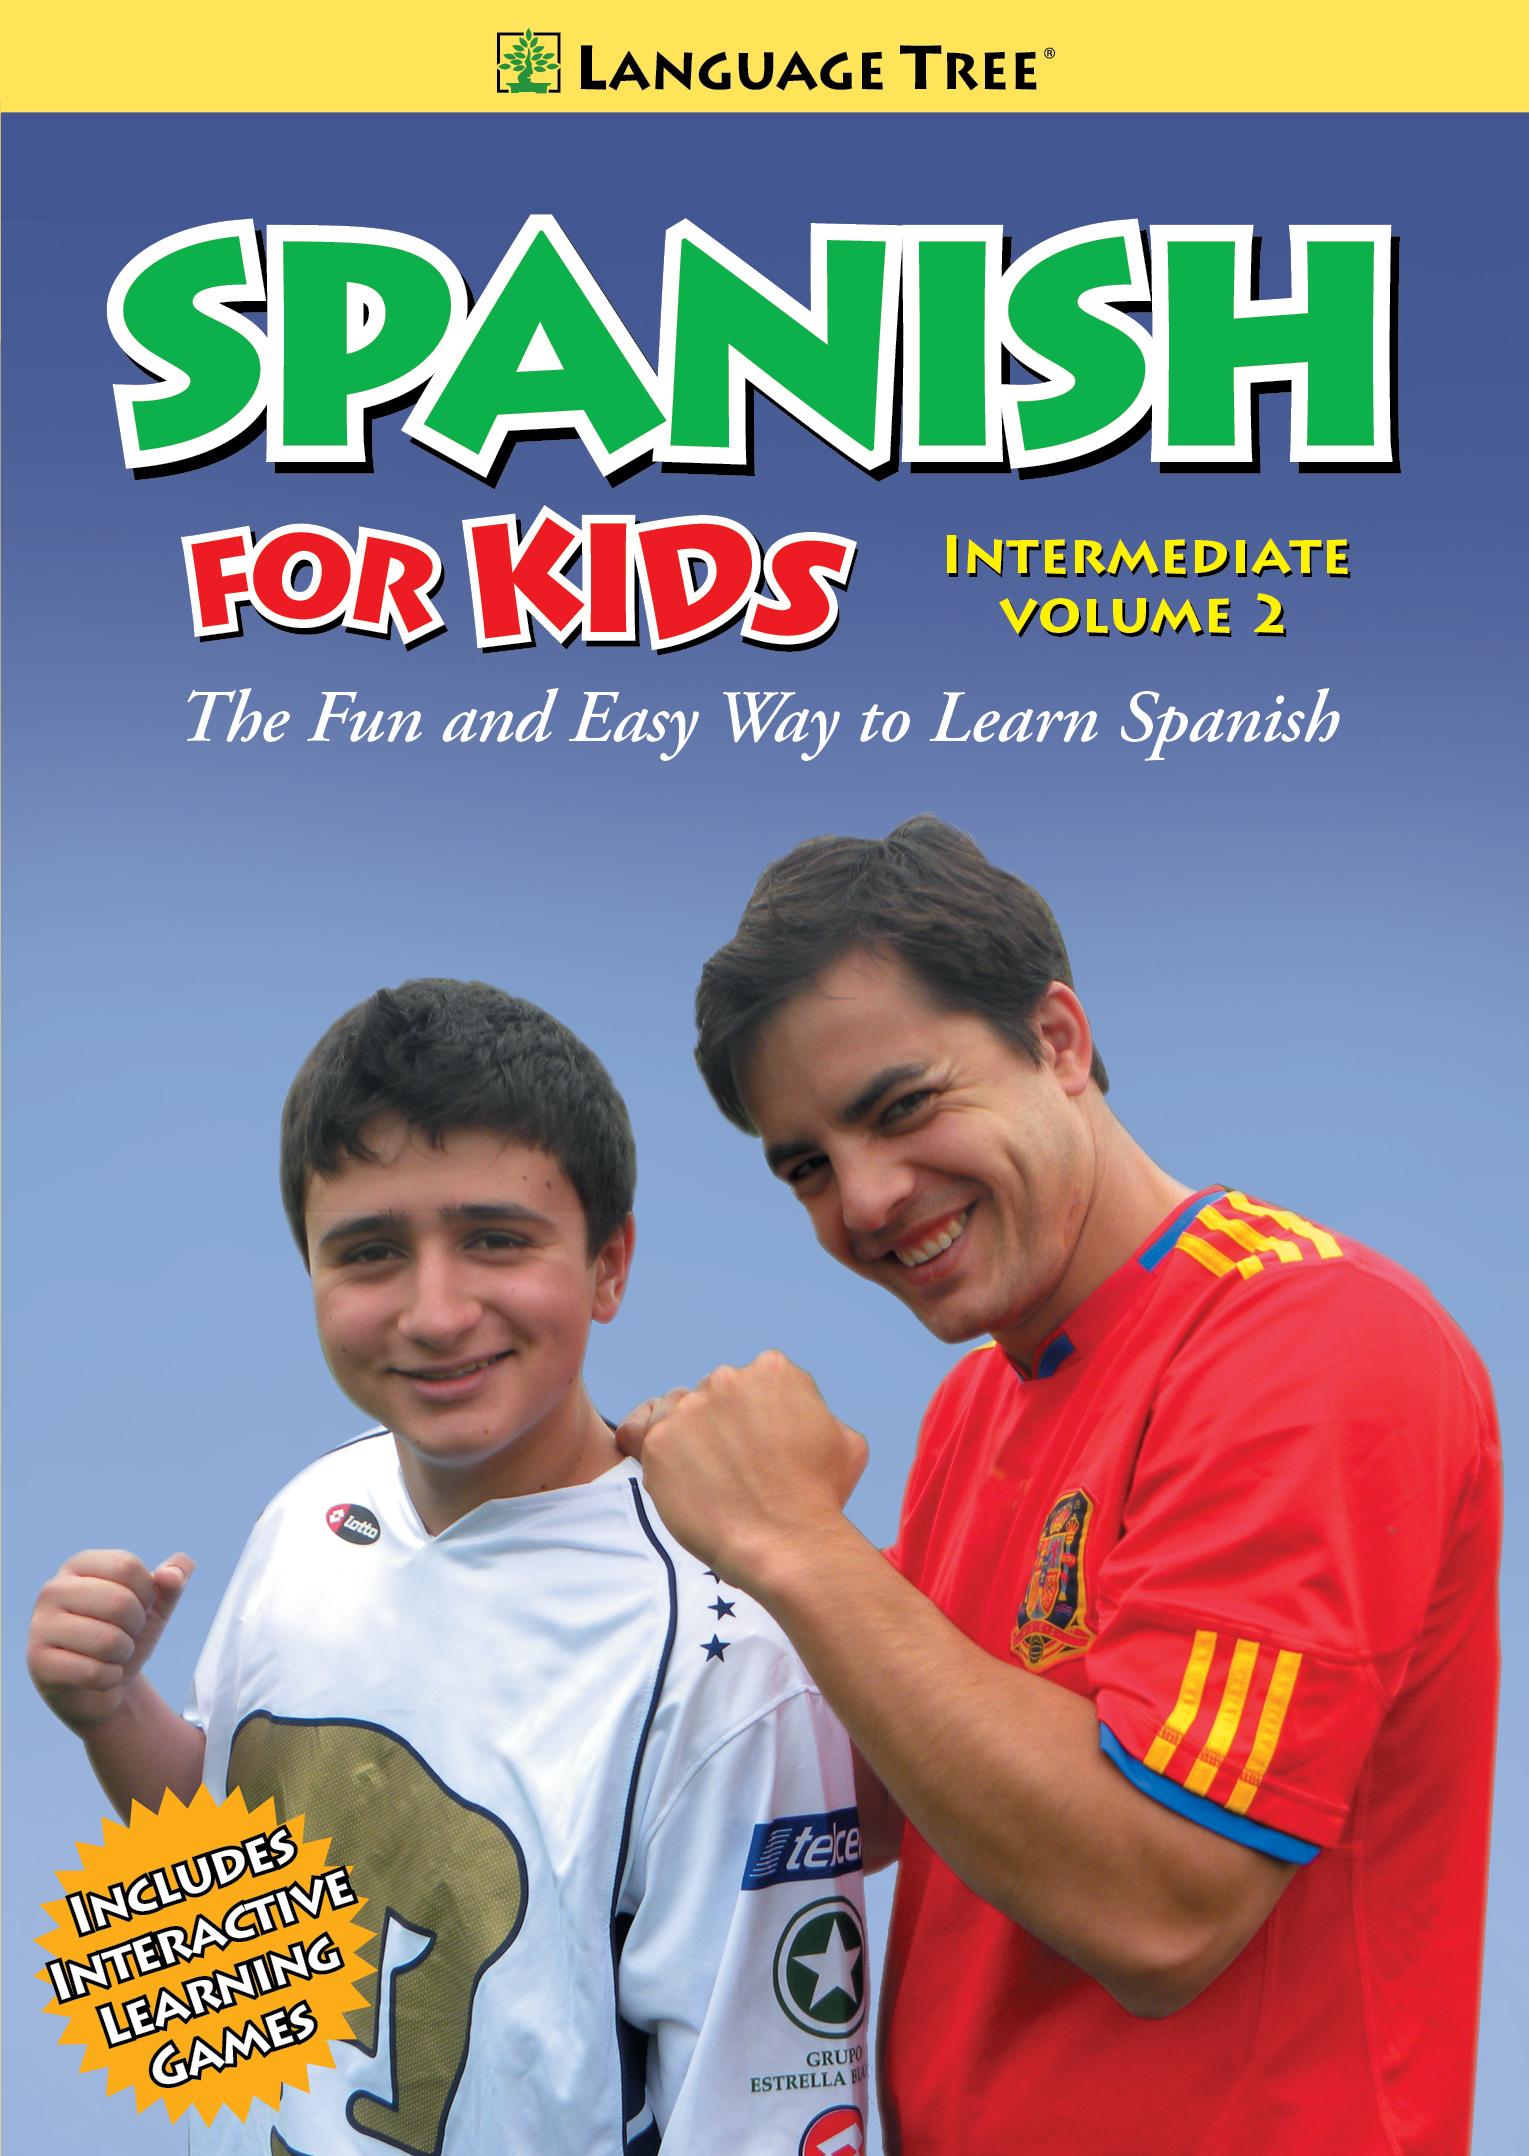 Spanish for Kids: Intermediate, Vol. 2